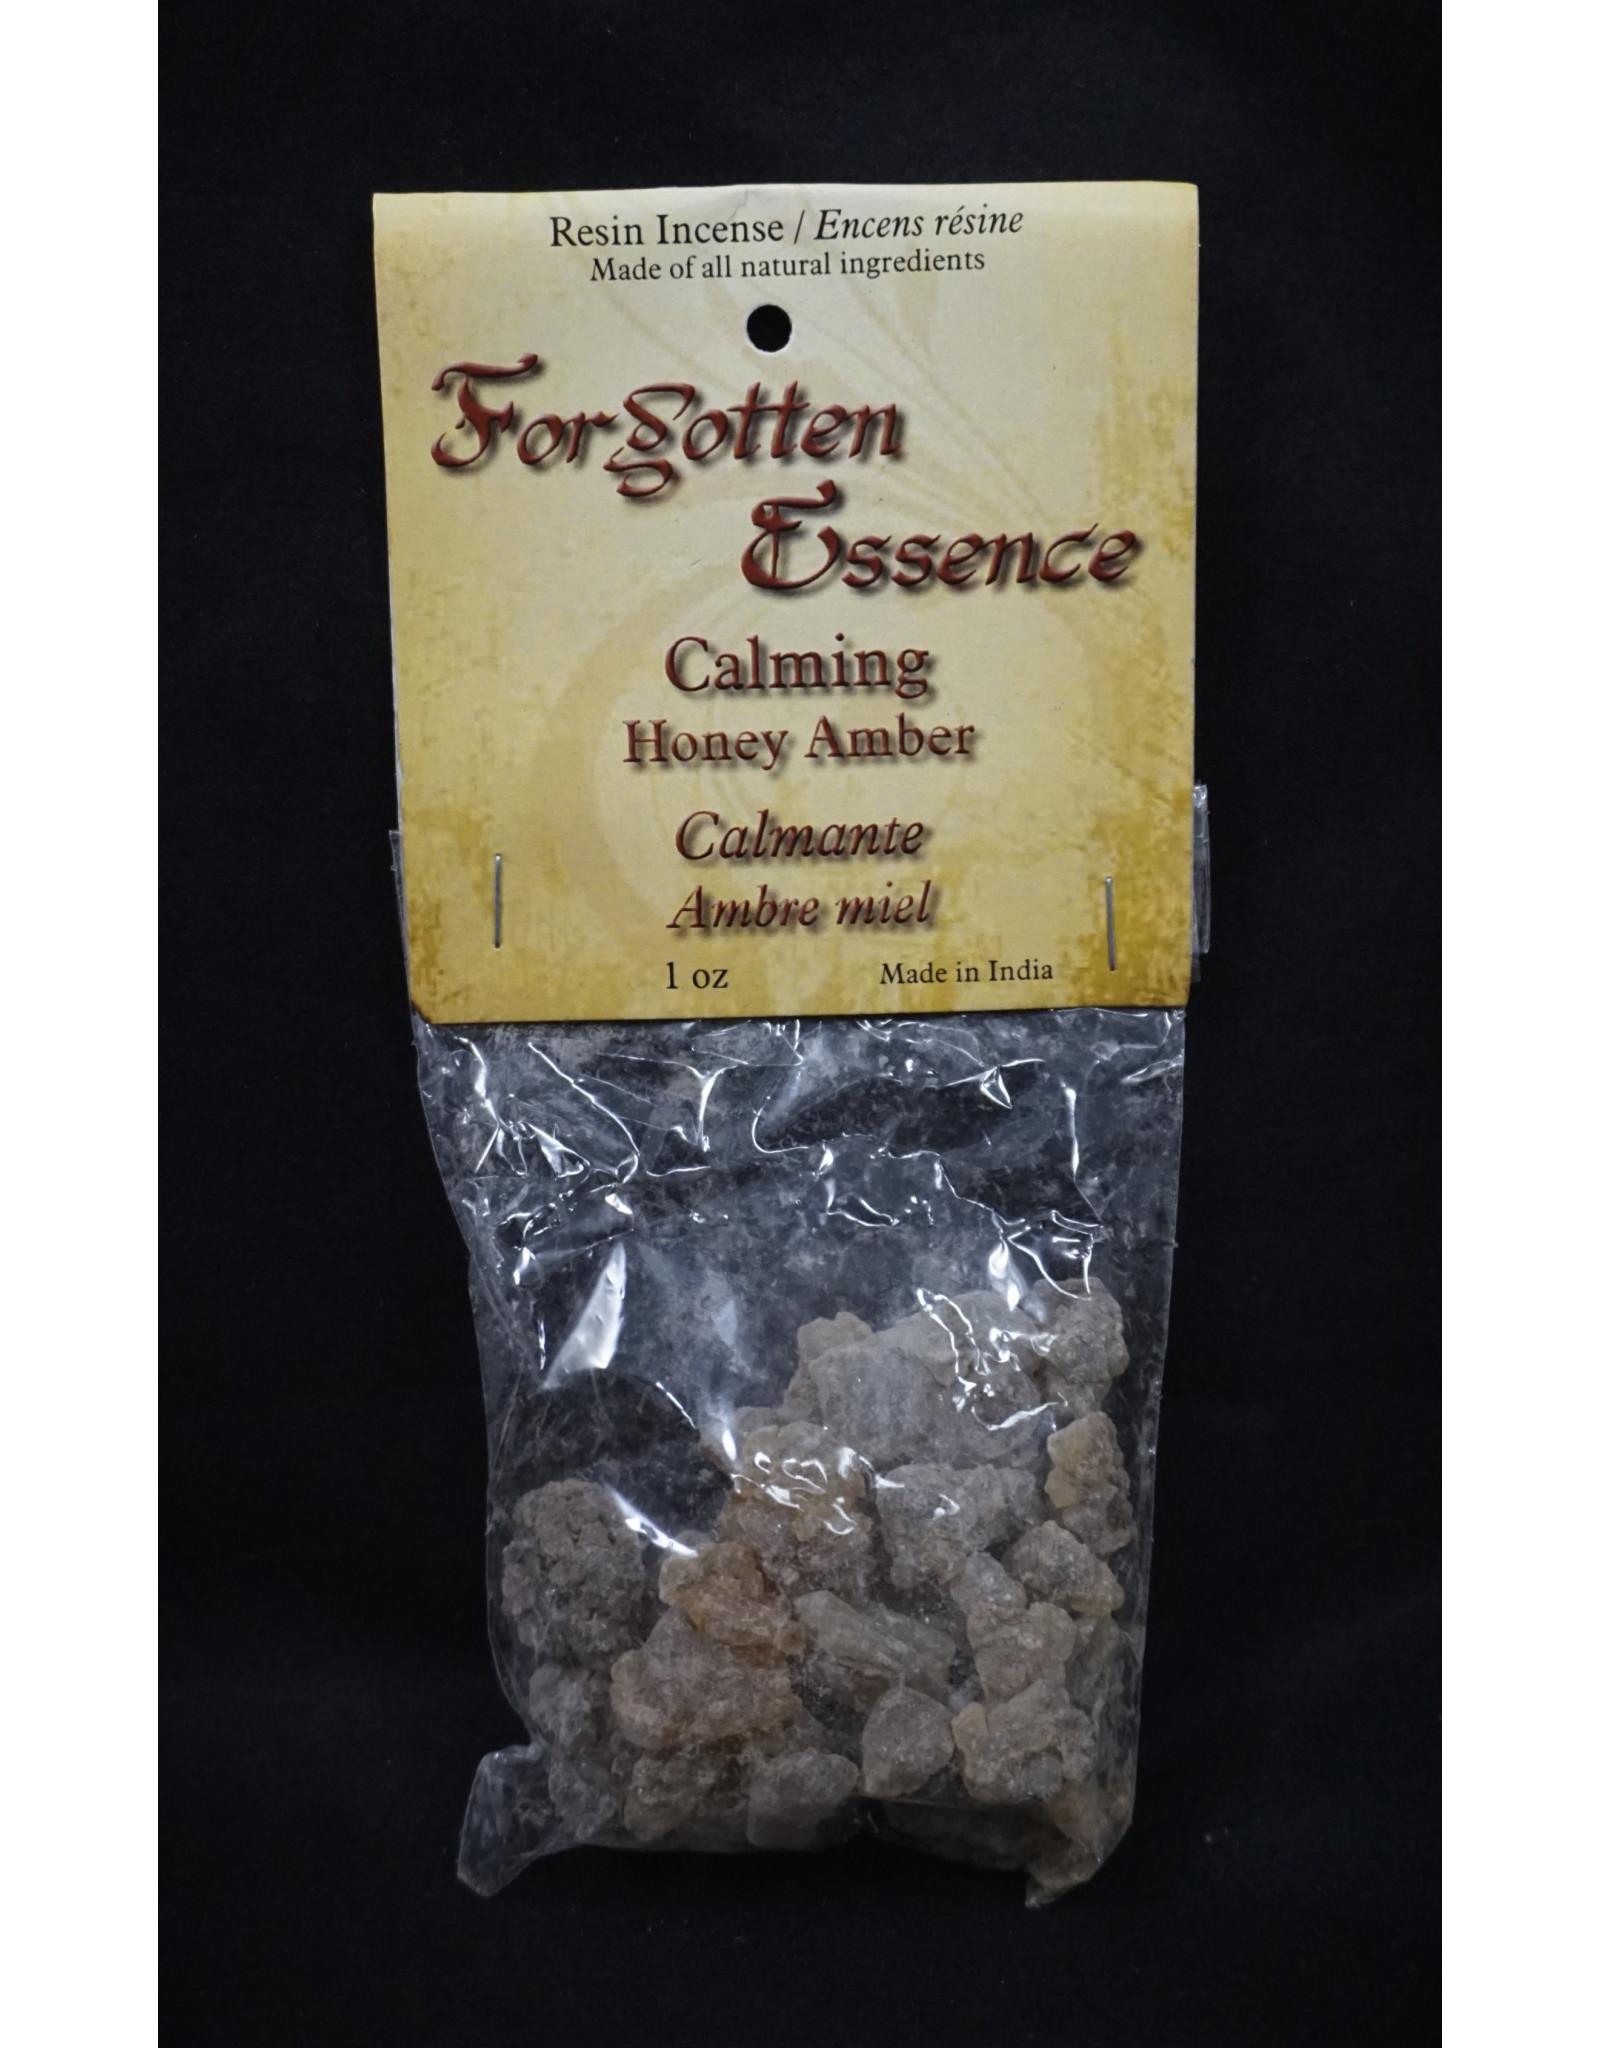 Forgotten Essence Resin Incense 1oz - Honey Amber